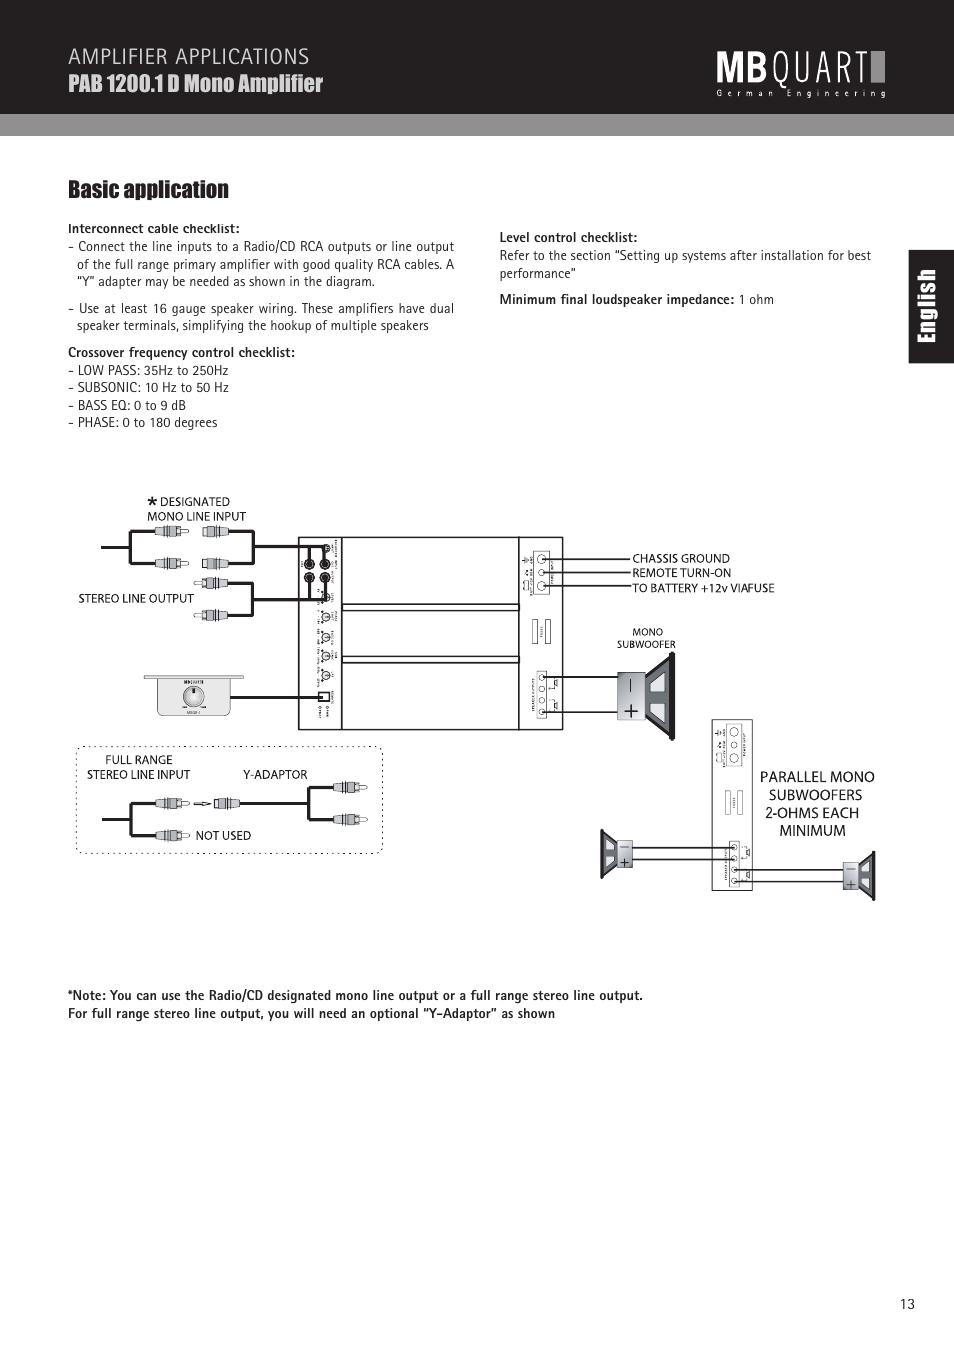 en gl is h basic application mb quart pab 1200 1 d user manual rh manualsdir com MB Quart Crossover Diagram mb quart crossover wiring diagram